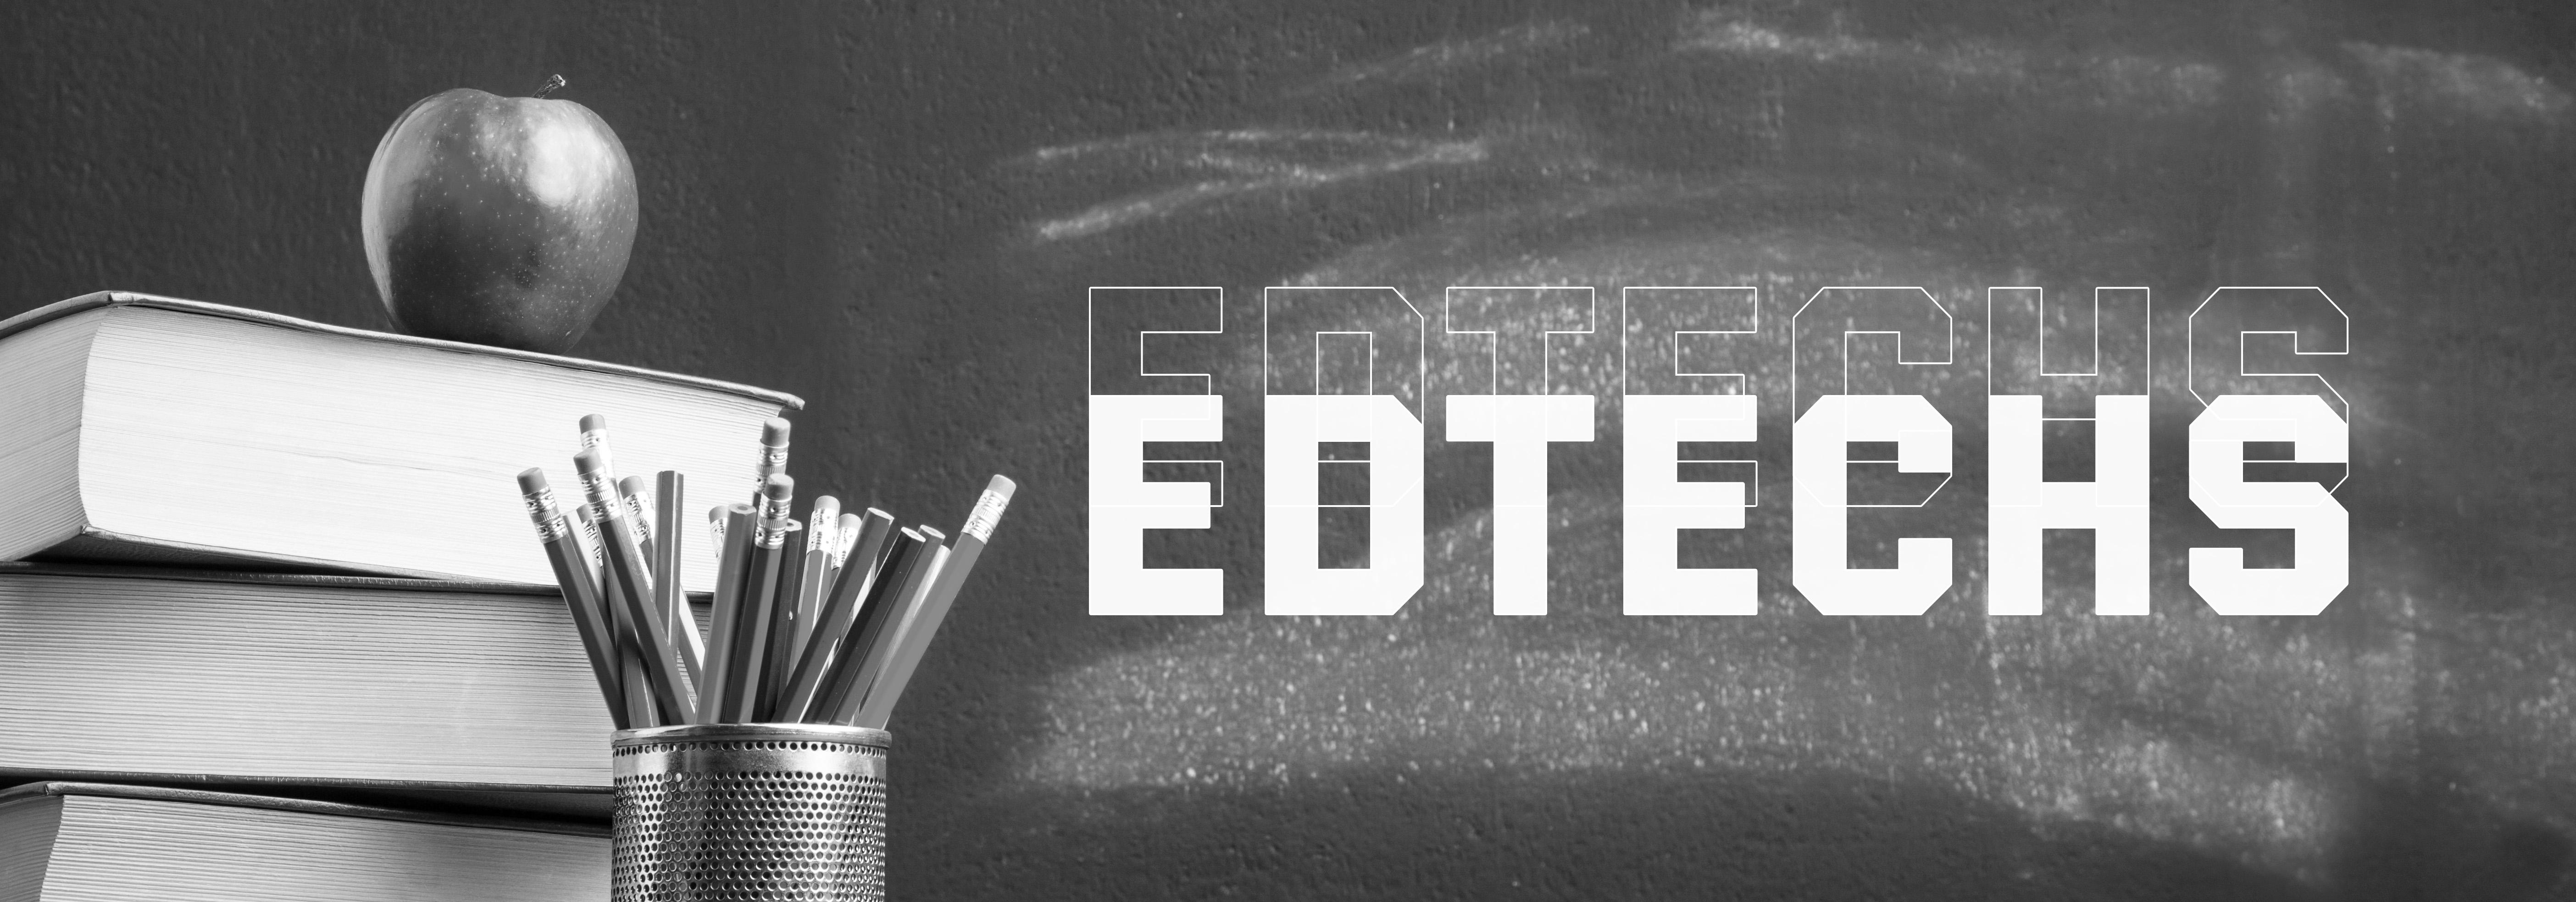 edtechs